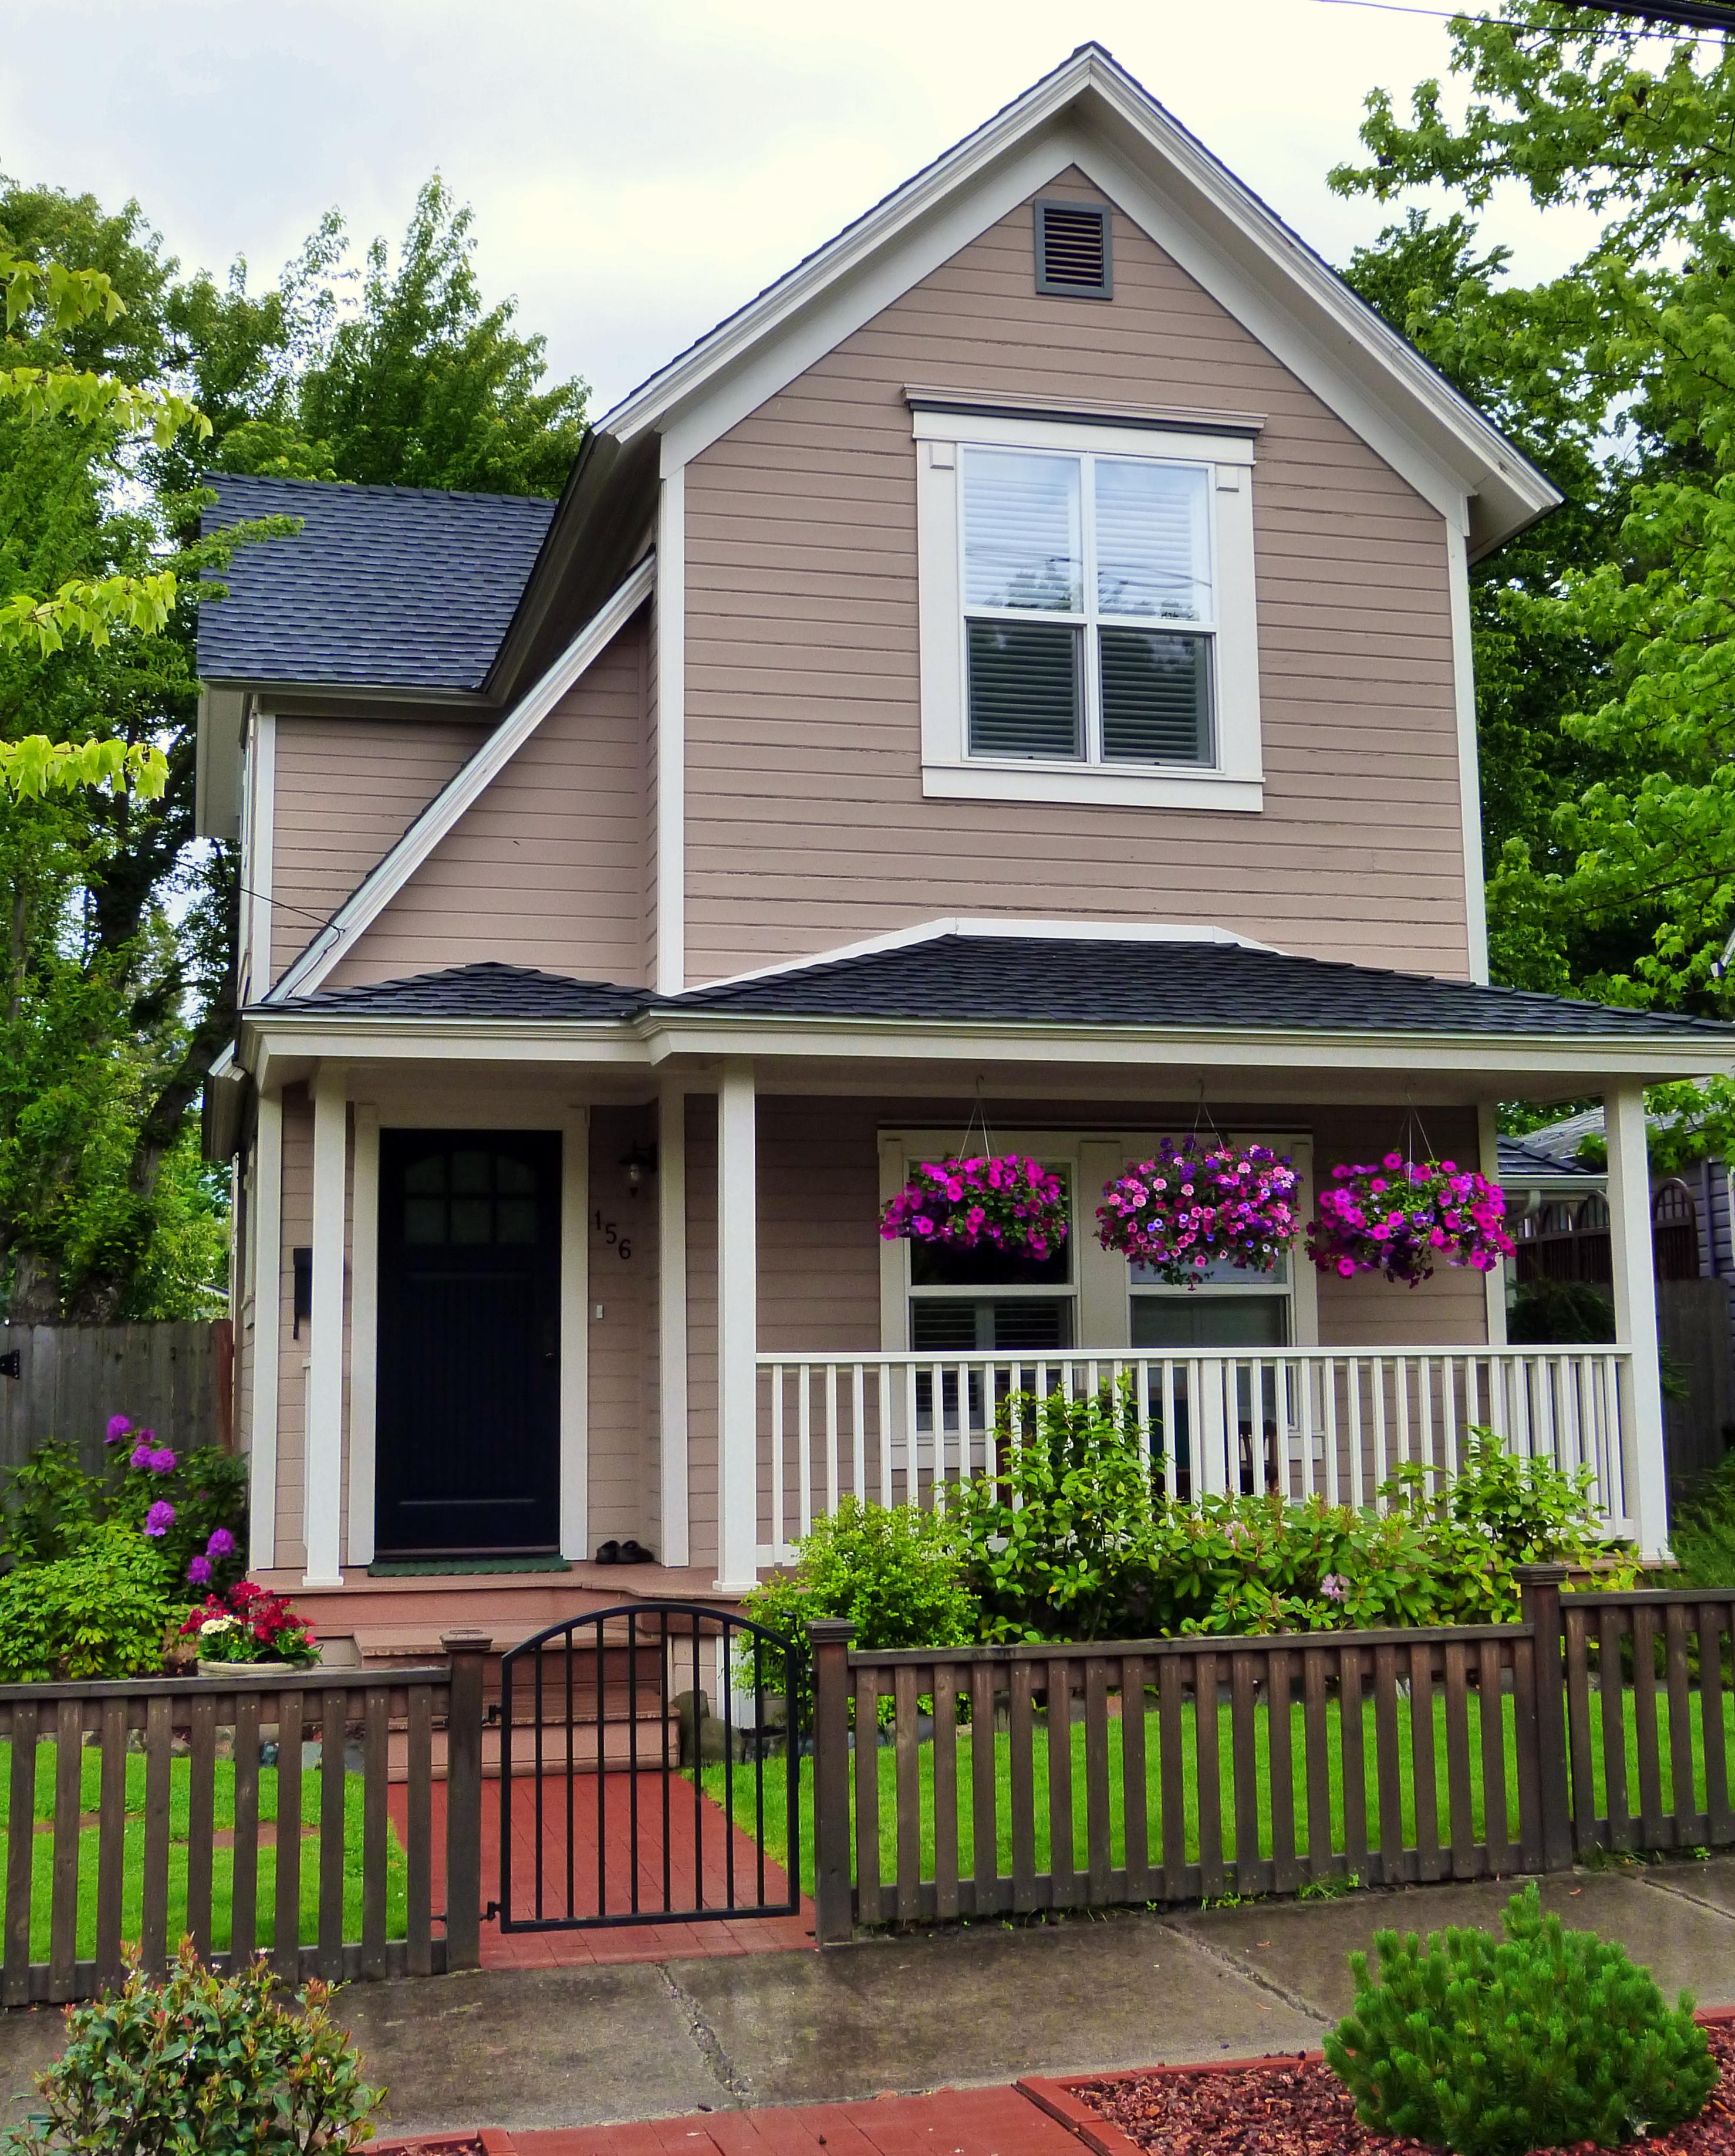 FileHudson Rental House Ashland Oregong Wikimedia mons